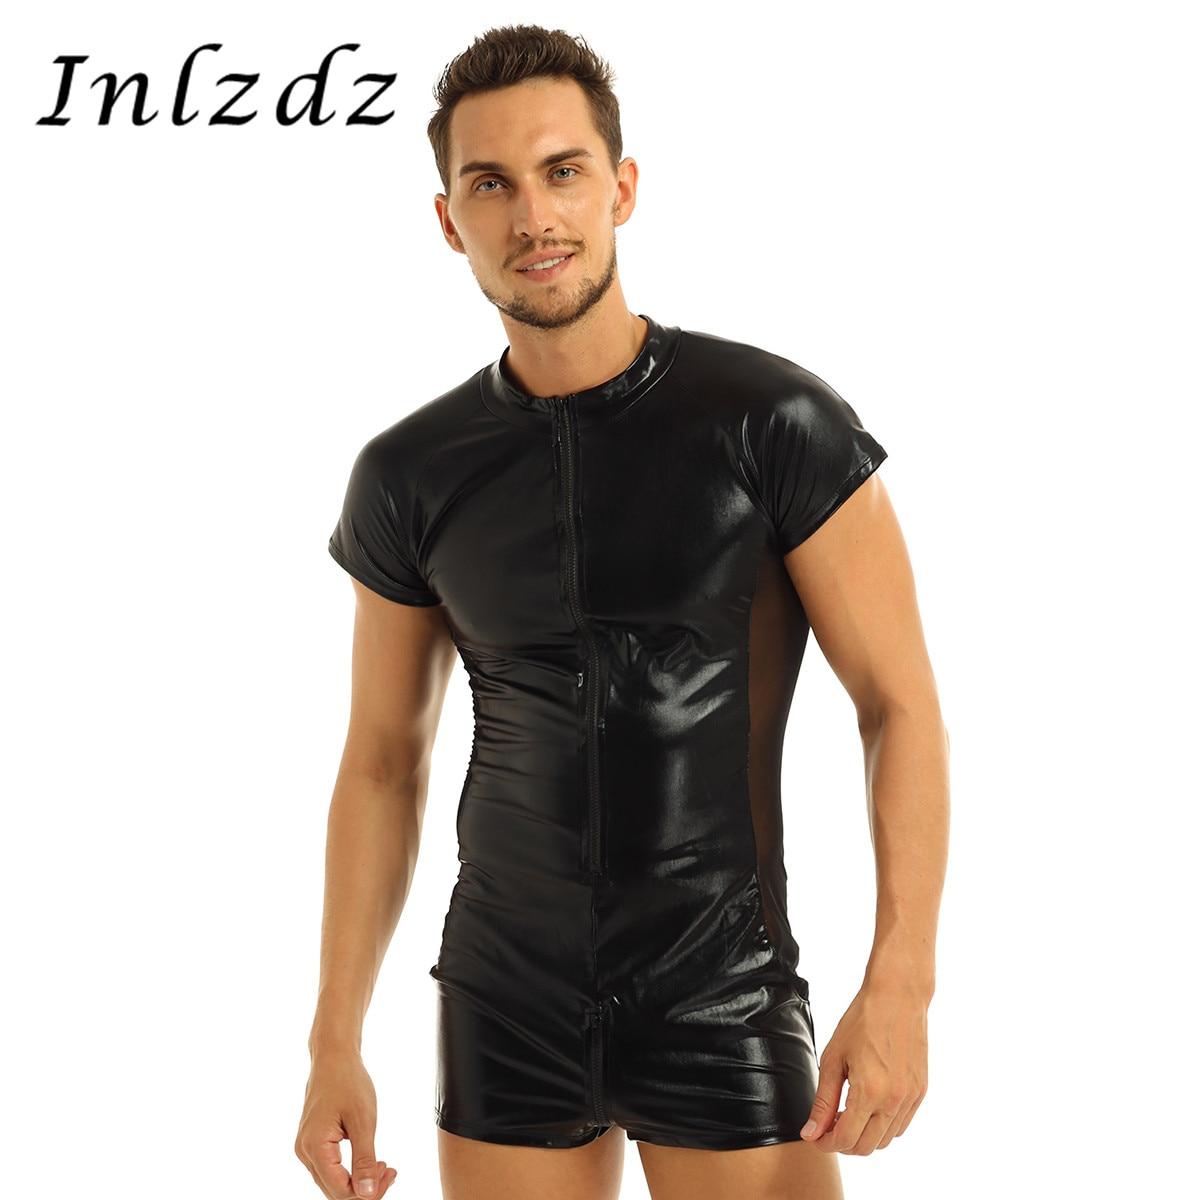 Herren Latex Body Patent Leder Trikot Body Front Zipper Dessous mit Mesh Seite Boxer Shorts Sex Kostüm Homosexuell Body